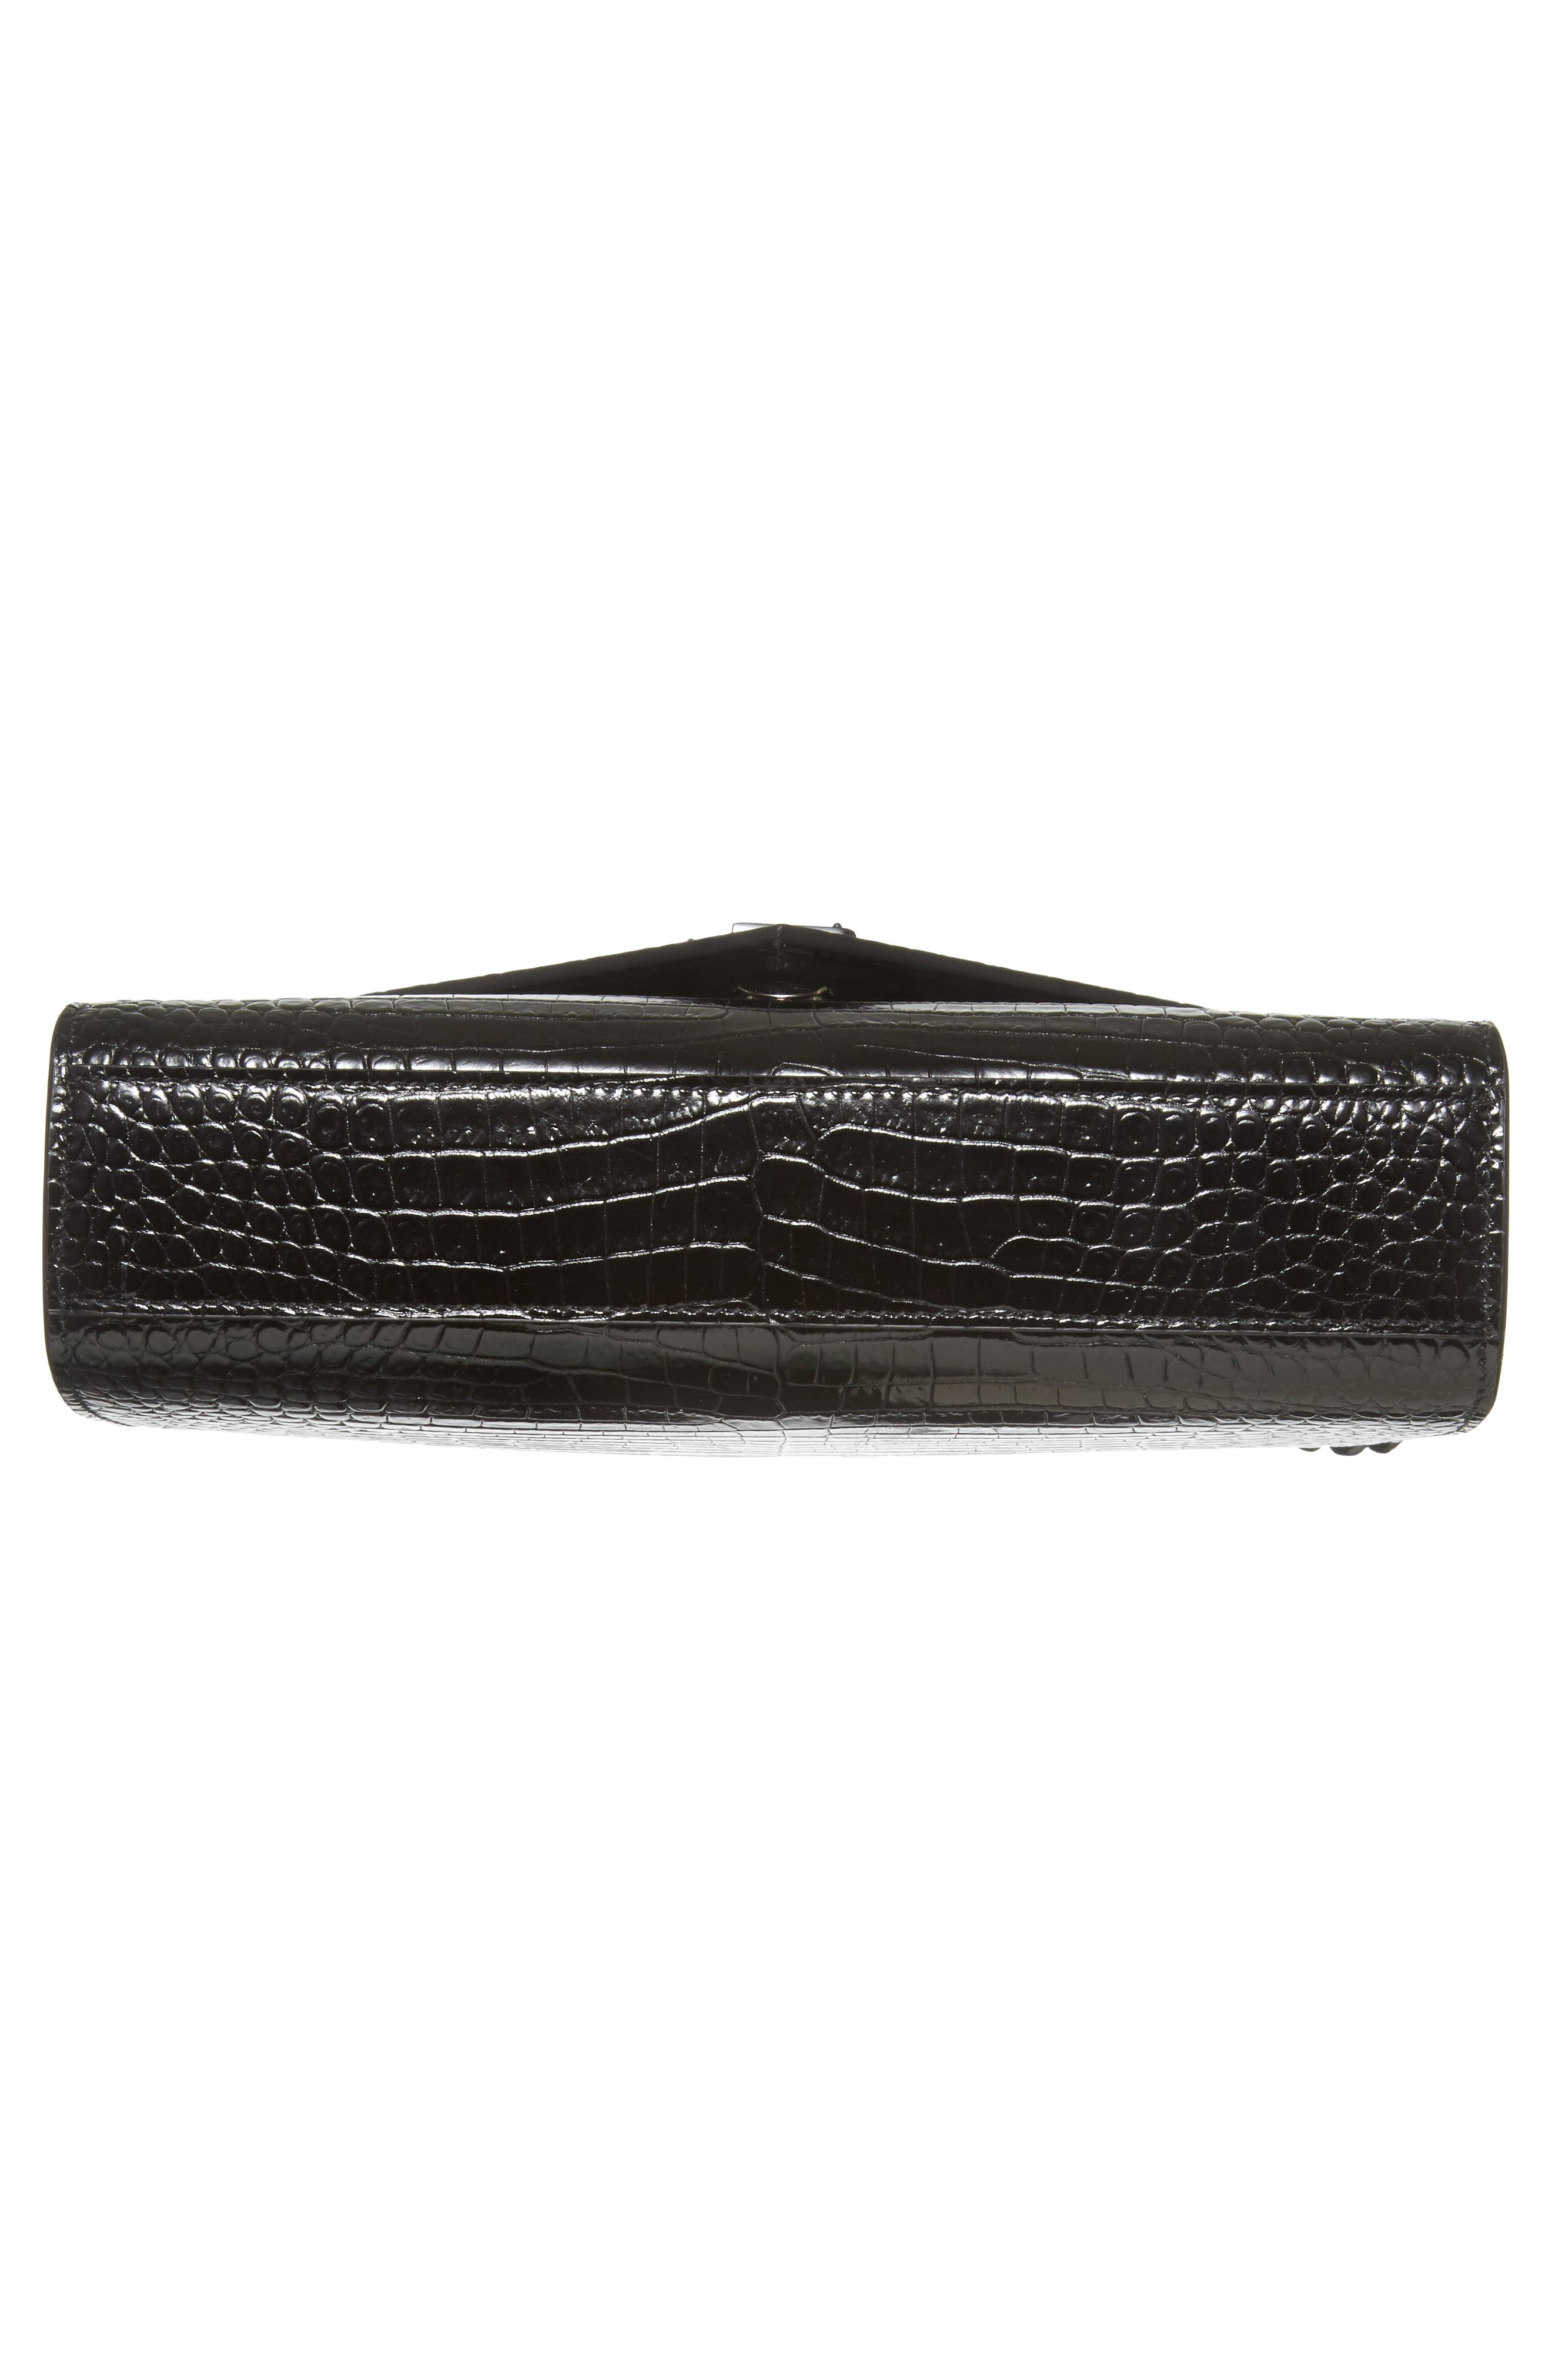 Medium Croc-Embossed Calfskin Shoulder Bag,                             Alternate thumbnail 6, color,                             001